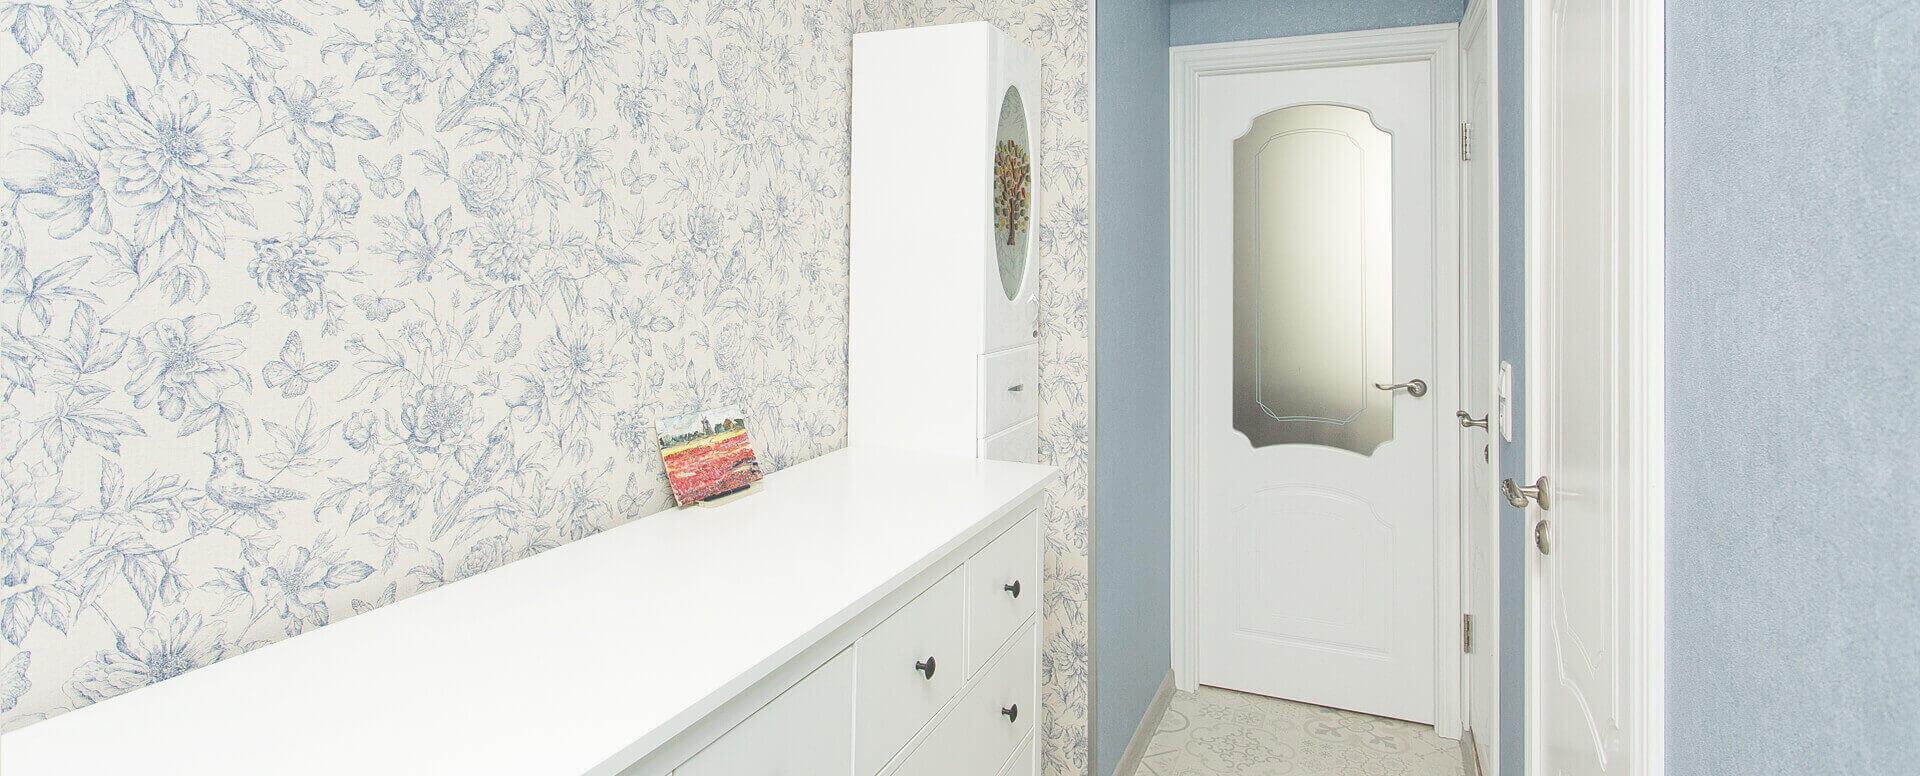 Косметический ремонт двухкомнатной квартиры